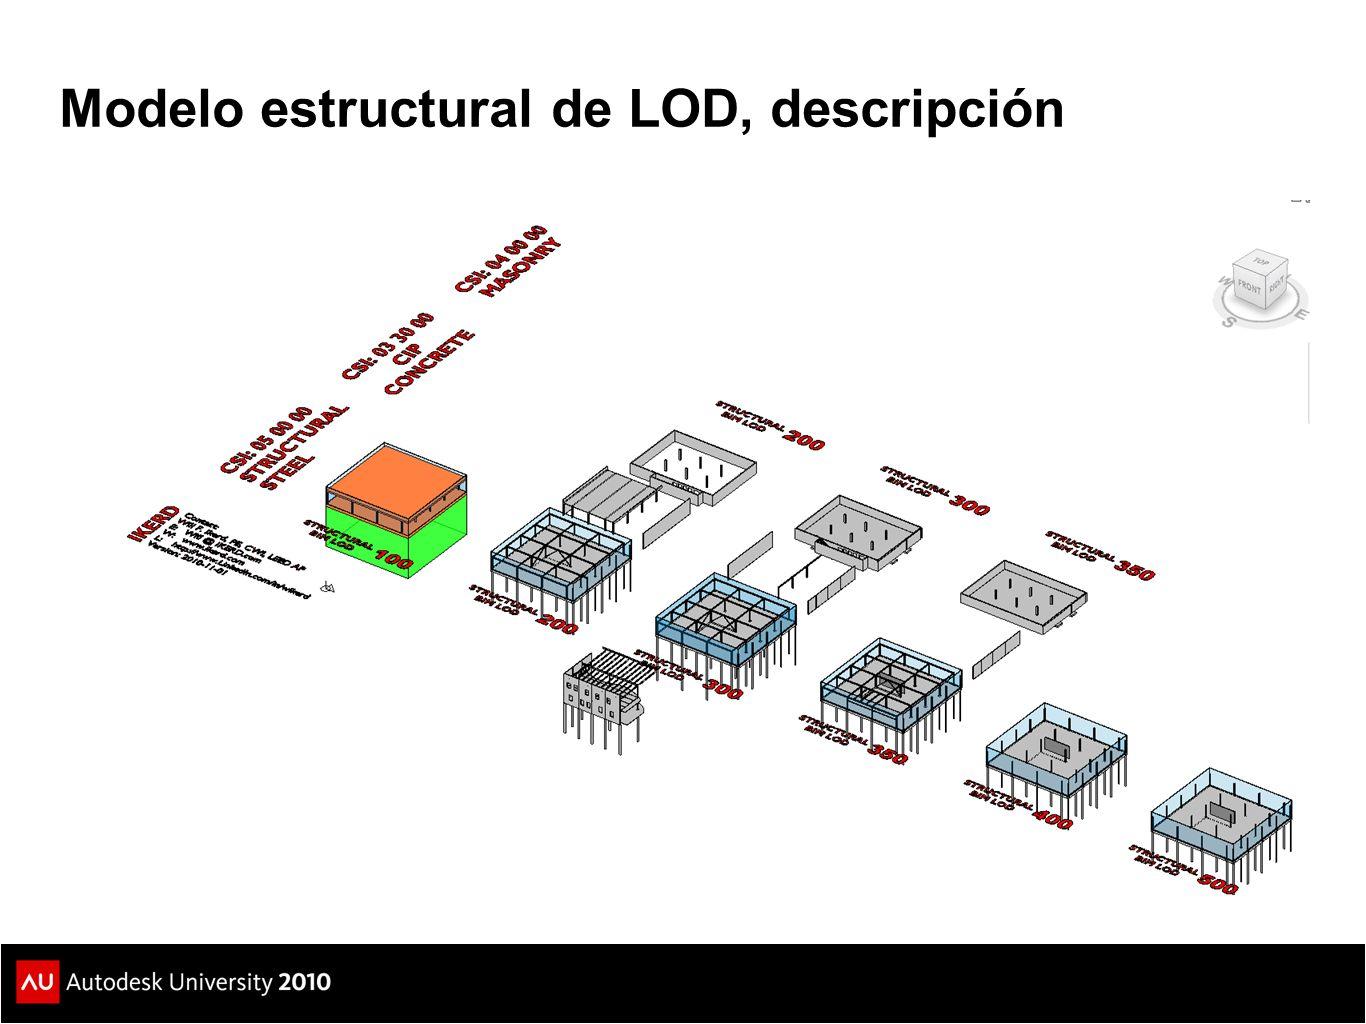 Modelo estructural de LOD, descripción